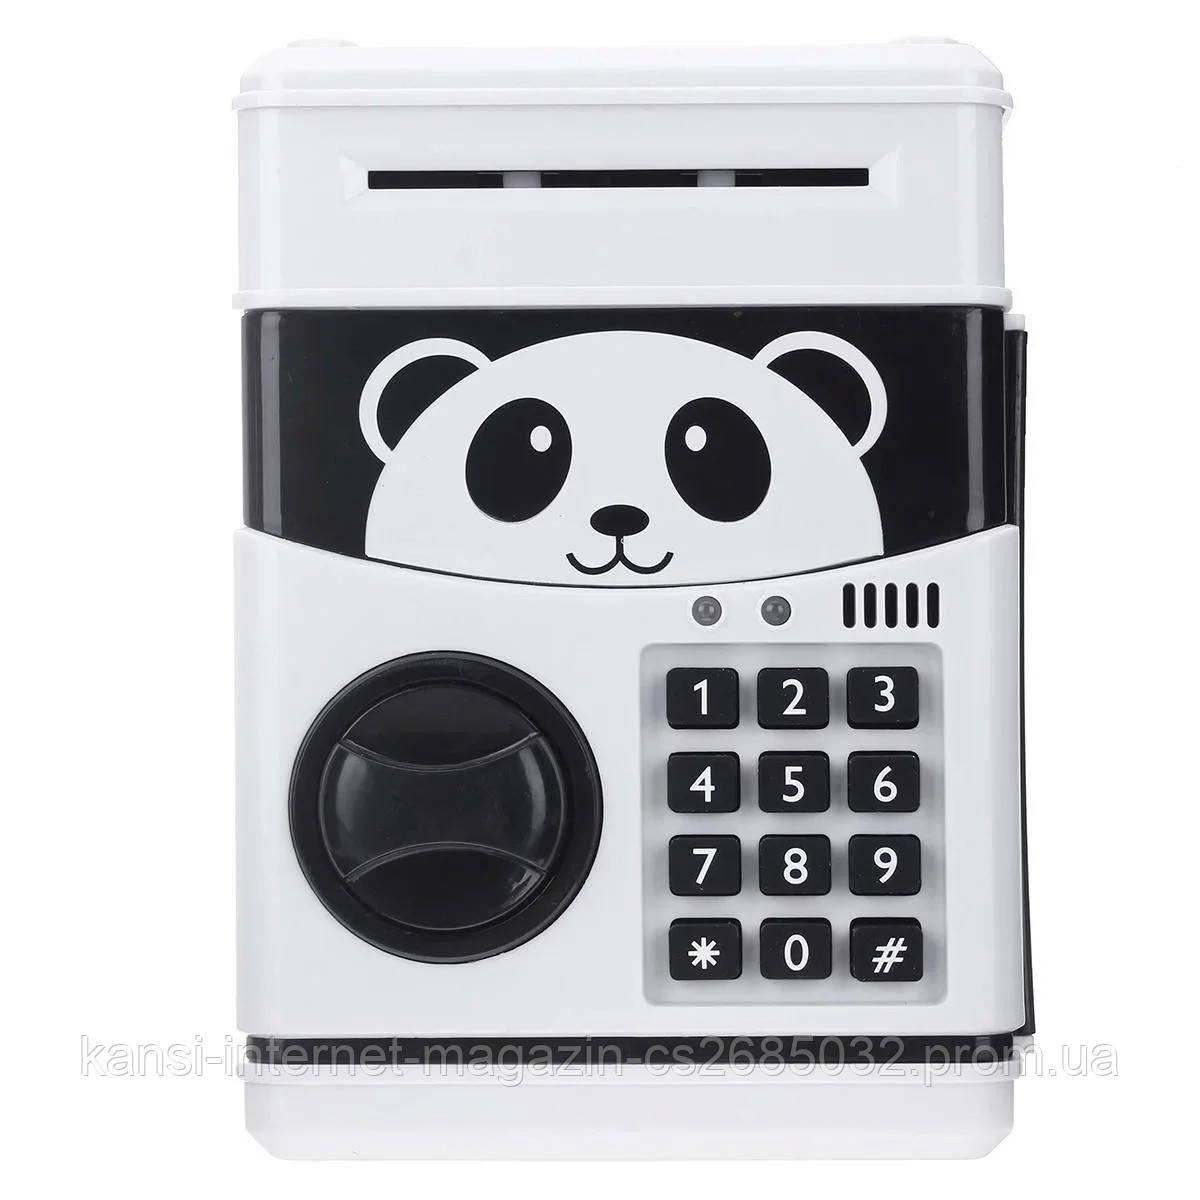 Електронна скарбничка Панда, дитячий банкомат з кодовим замком PANDA